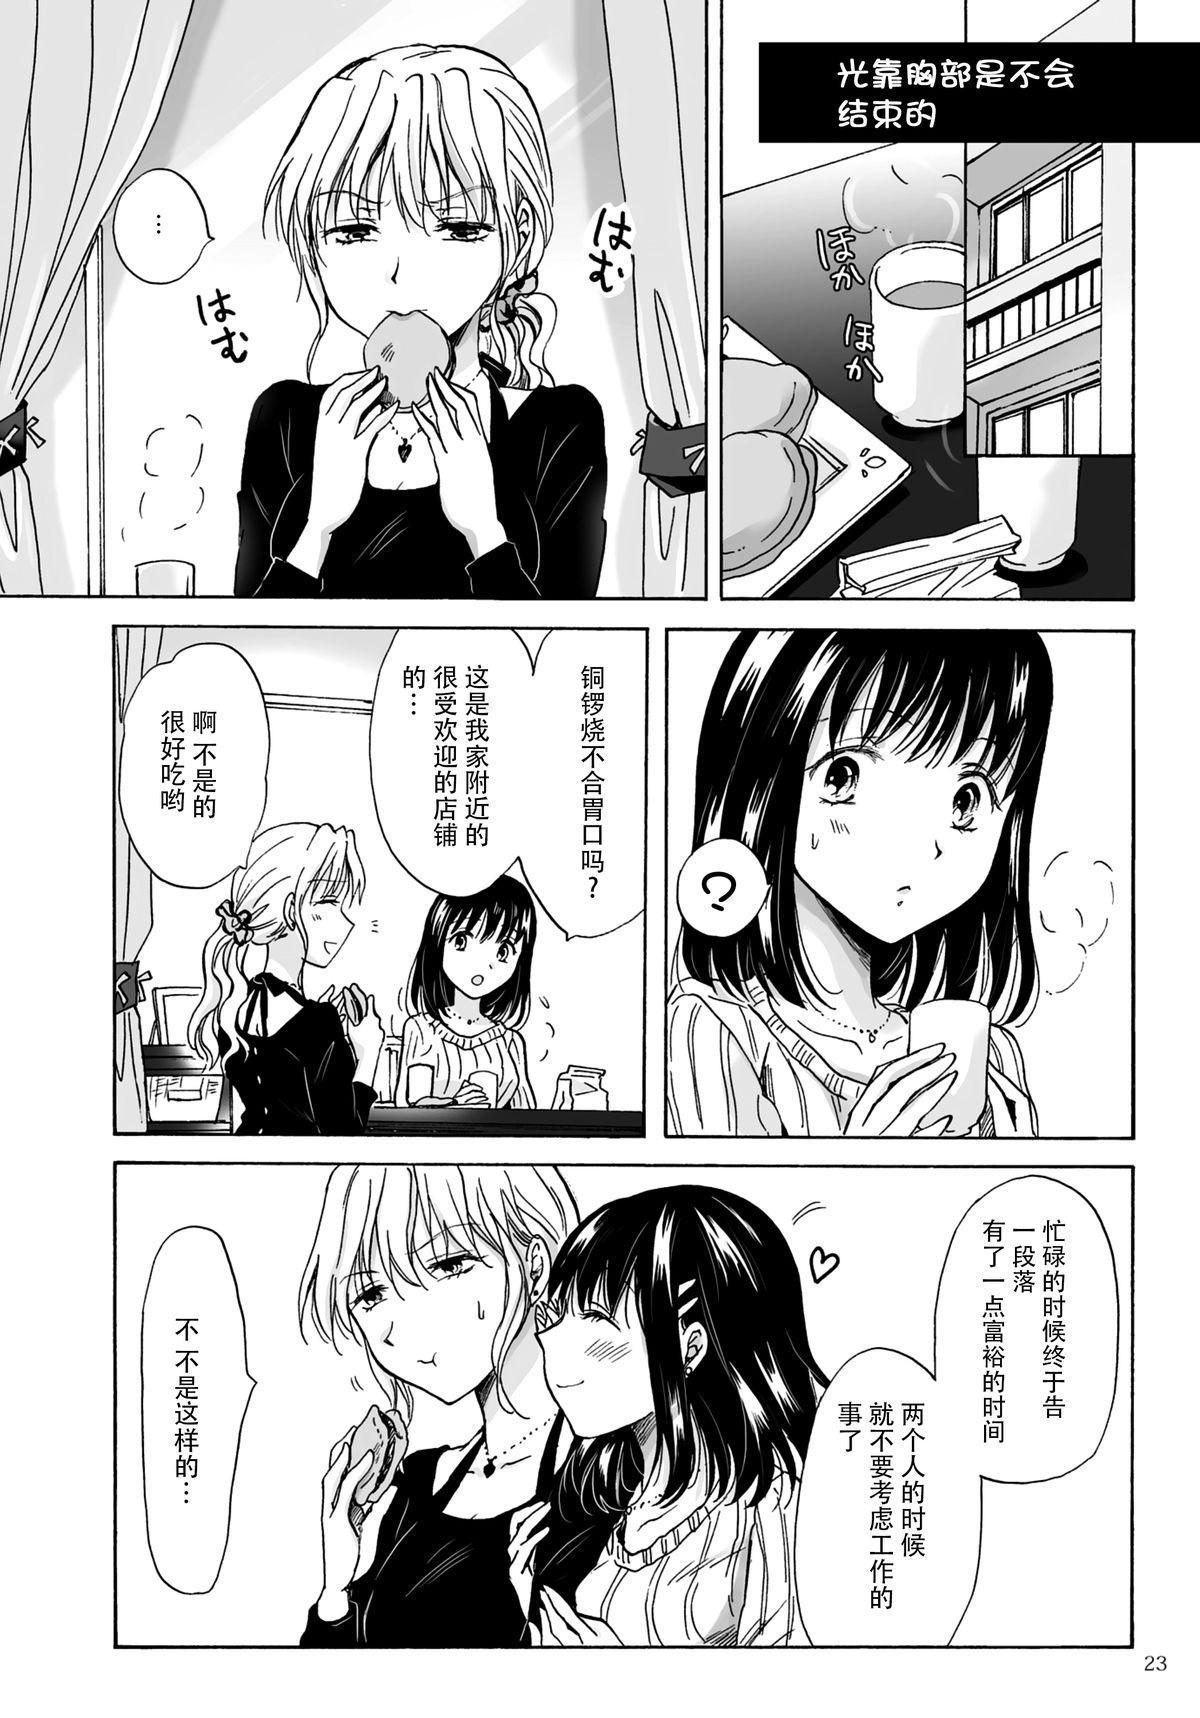 OL-san ga Oppai dake de Icchau Manga 23